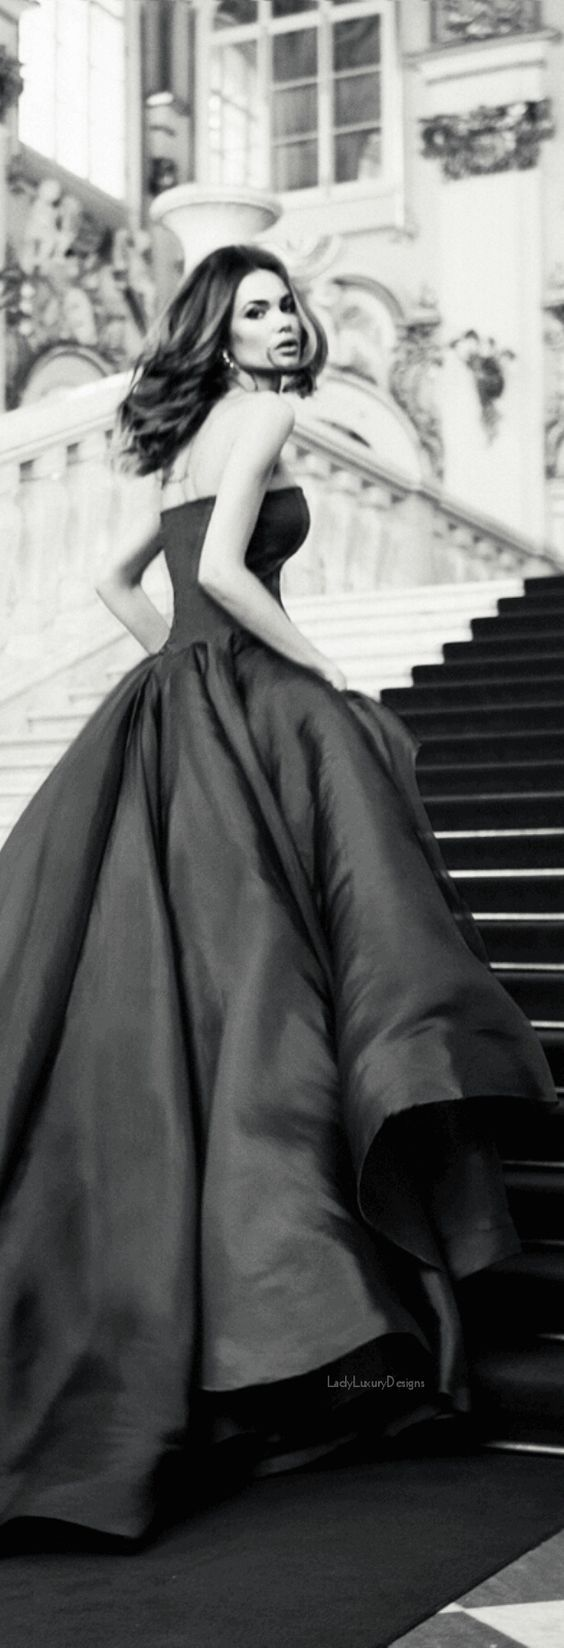 Black and White Lady Luxury Designs, www.lightondecor.com